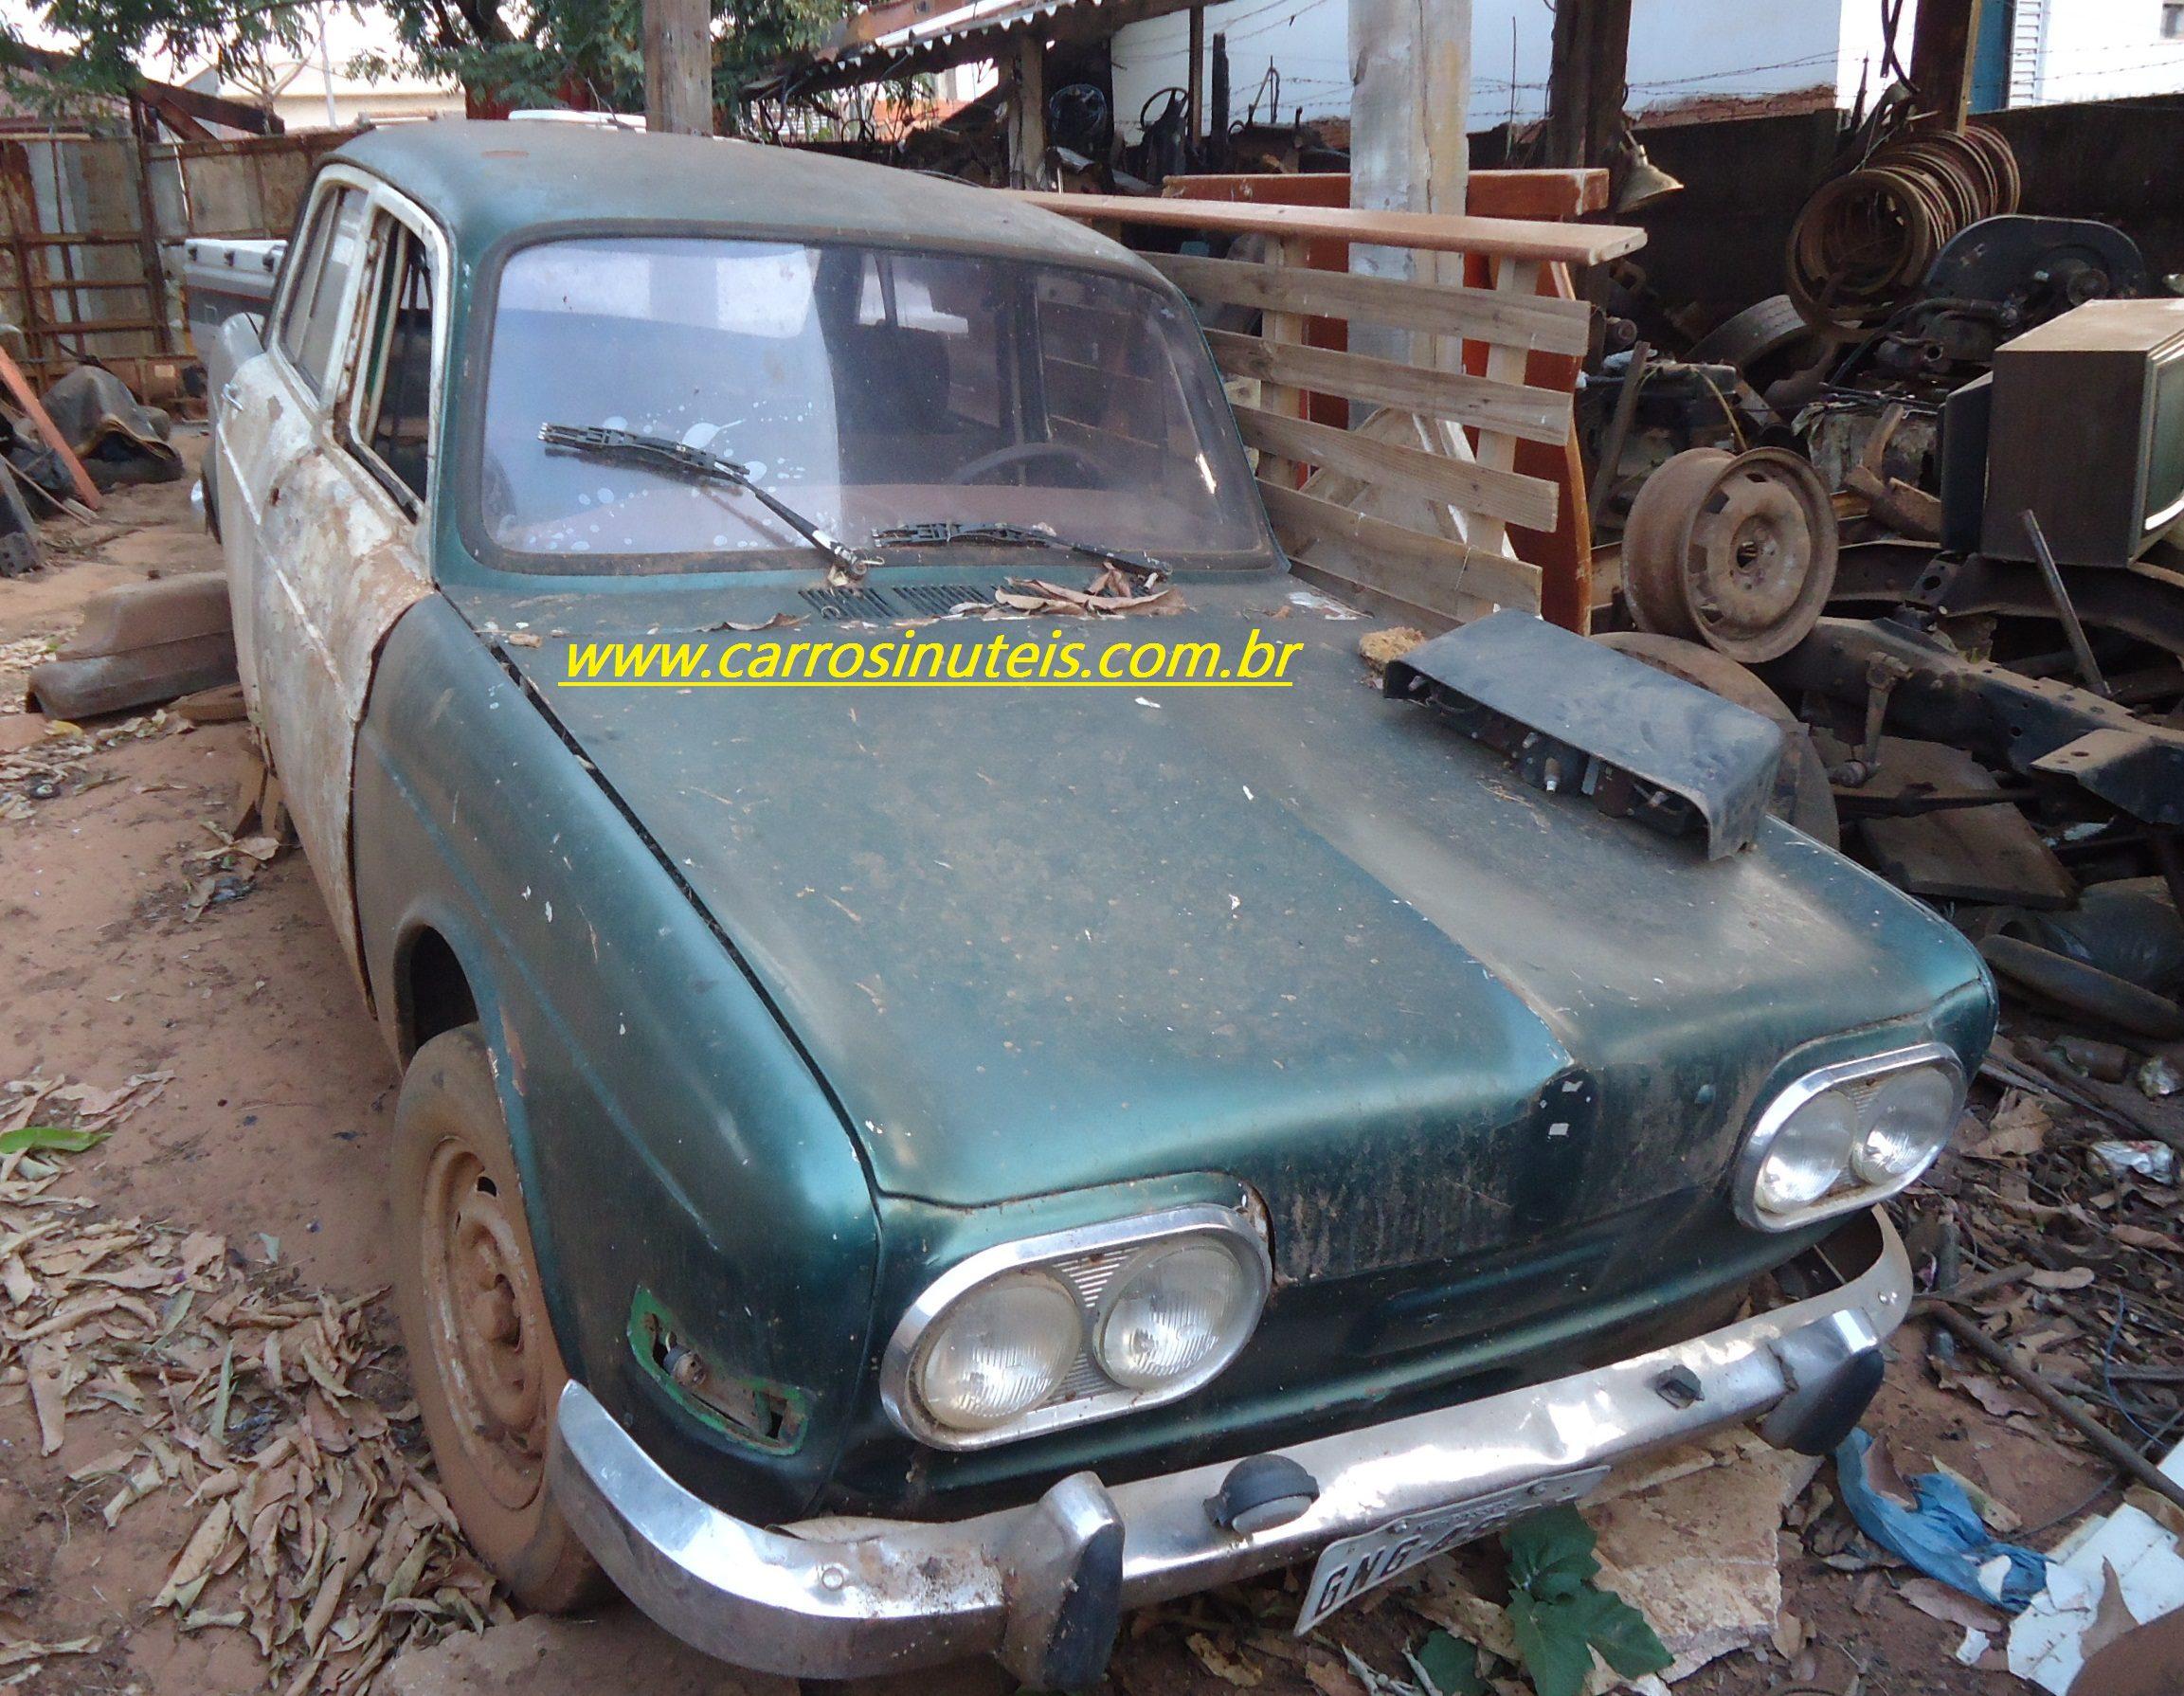 Nelson Val 233 Rio Piumhi Mg Vw 1600 Carros In 250 Teis